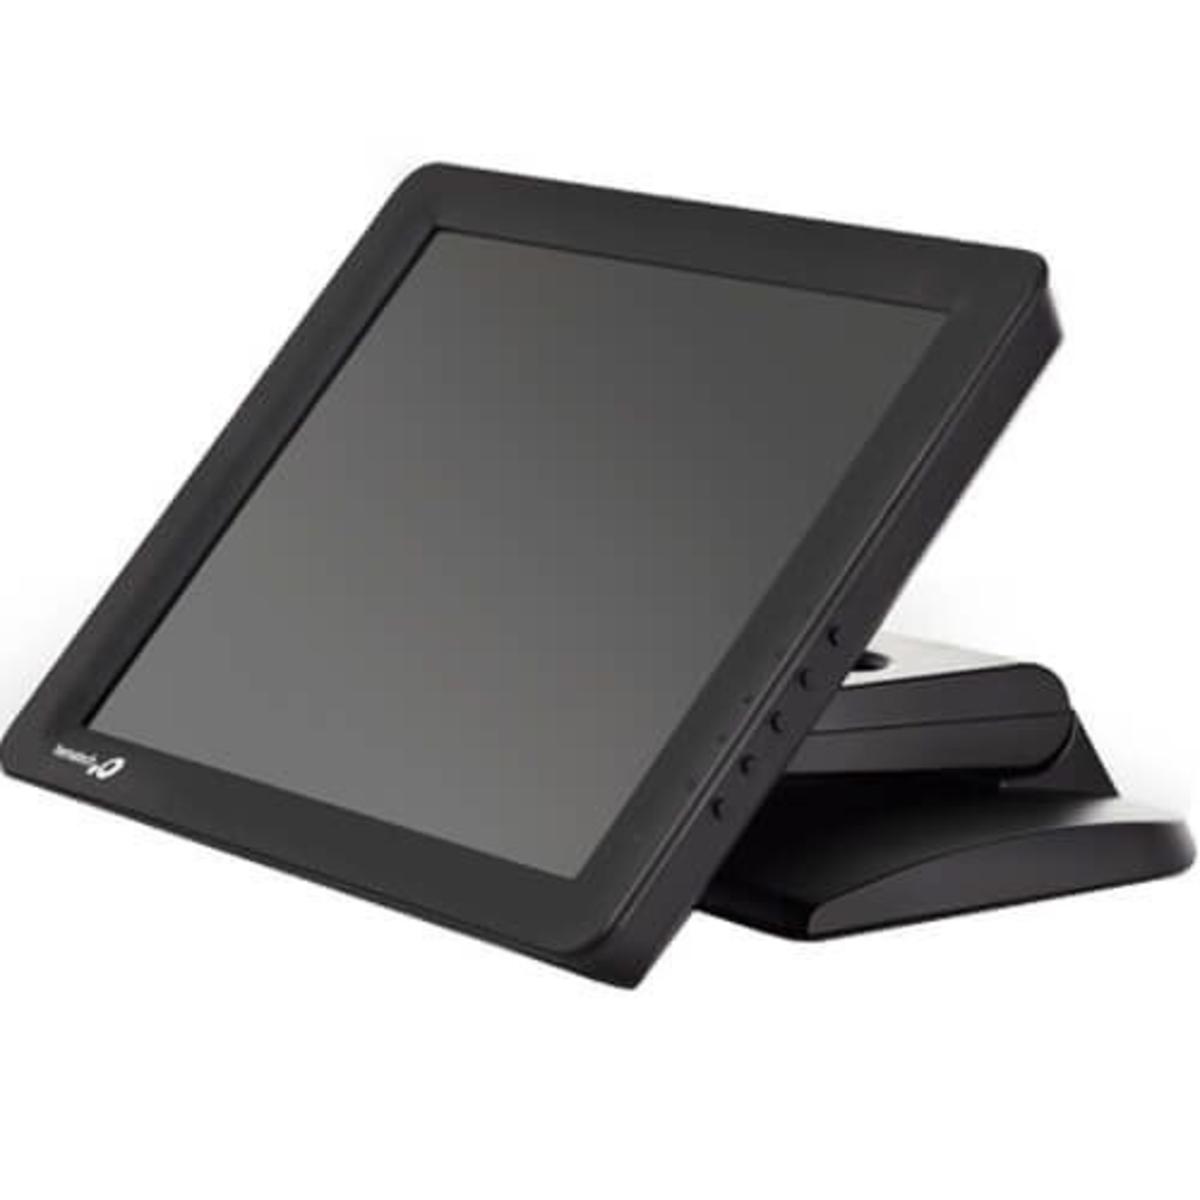 Monitor Touch Screen Bematech 15 POL. CM-15 - Capacitivo